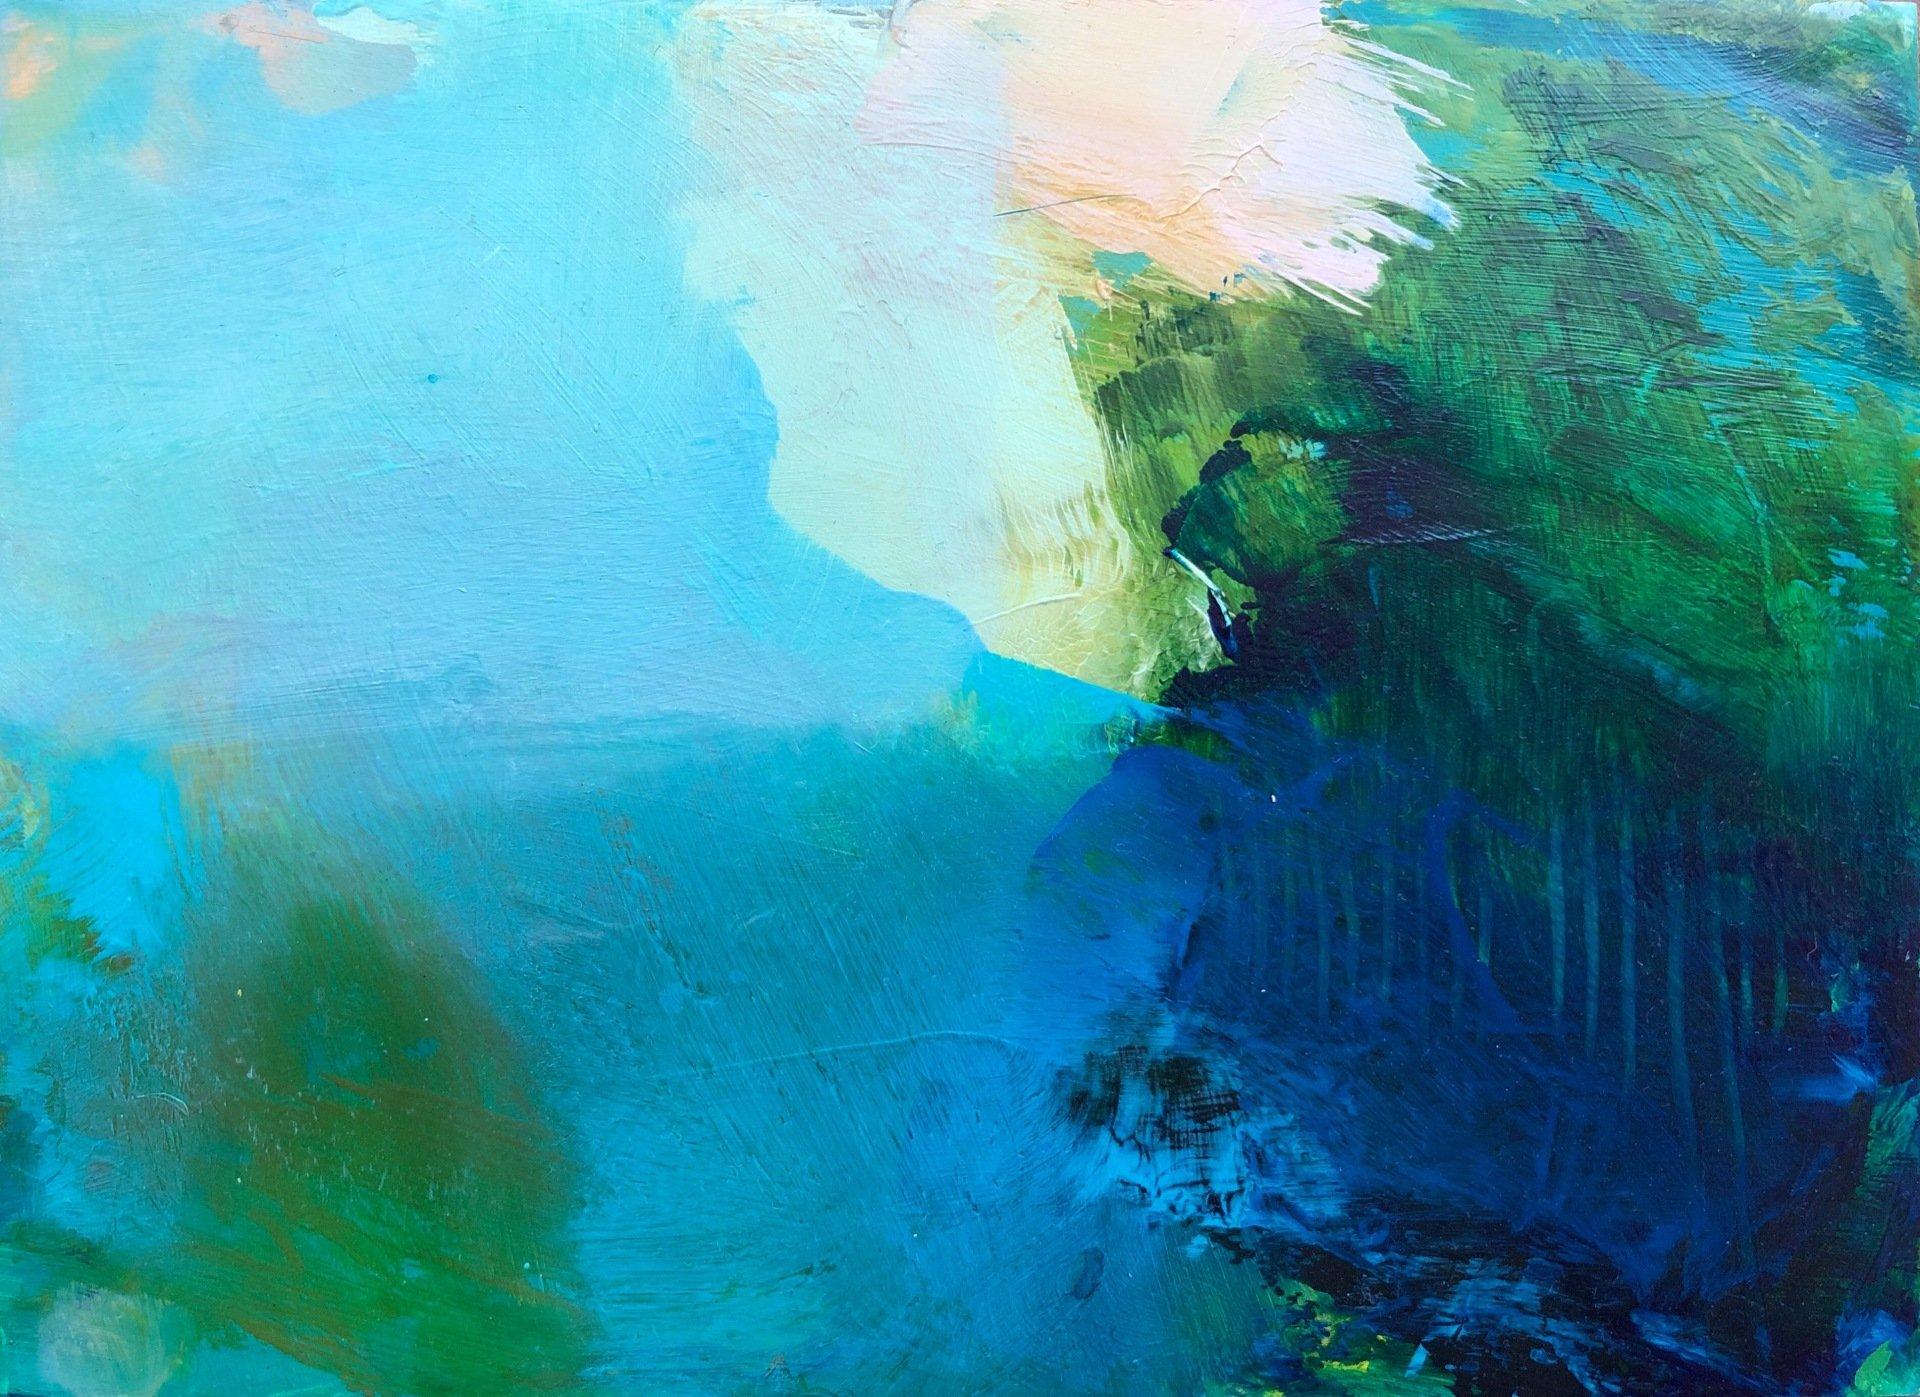 Laura+Rich,+Waters+Edge+study+1,+oil+on+panel,+18+x+13cms+.jpg